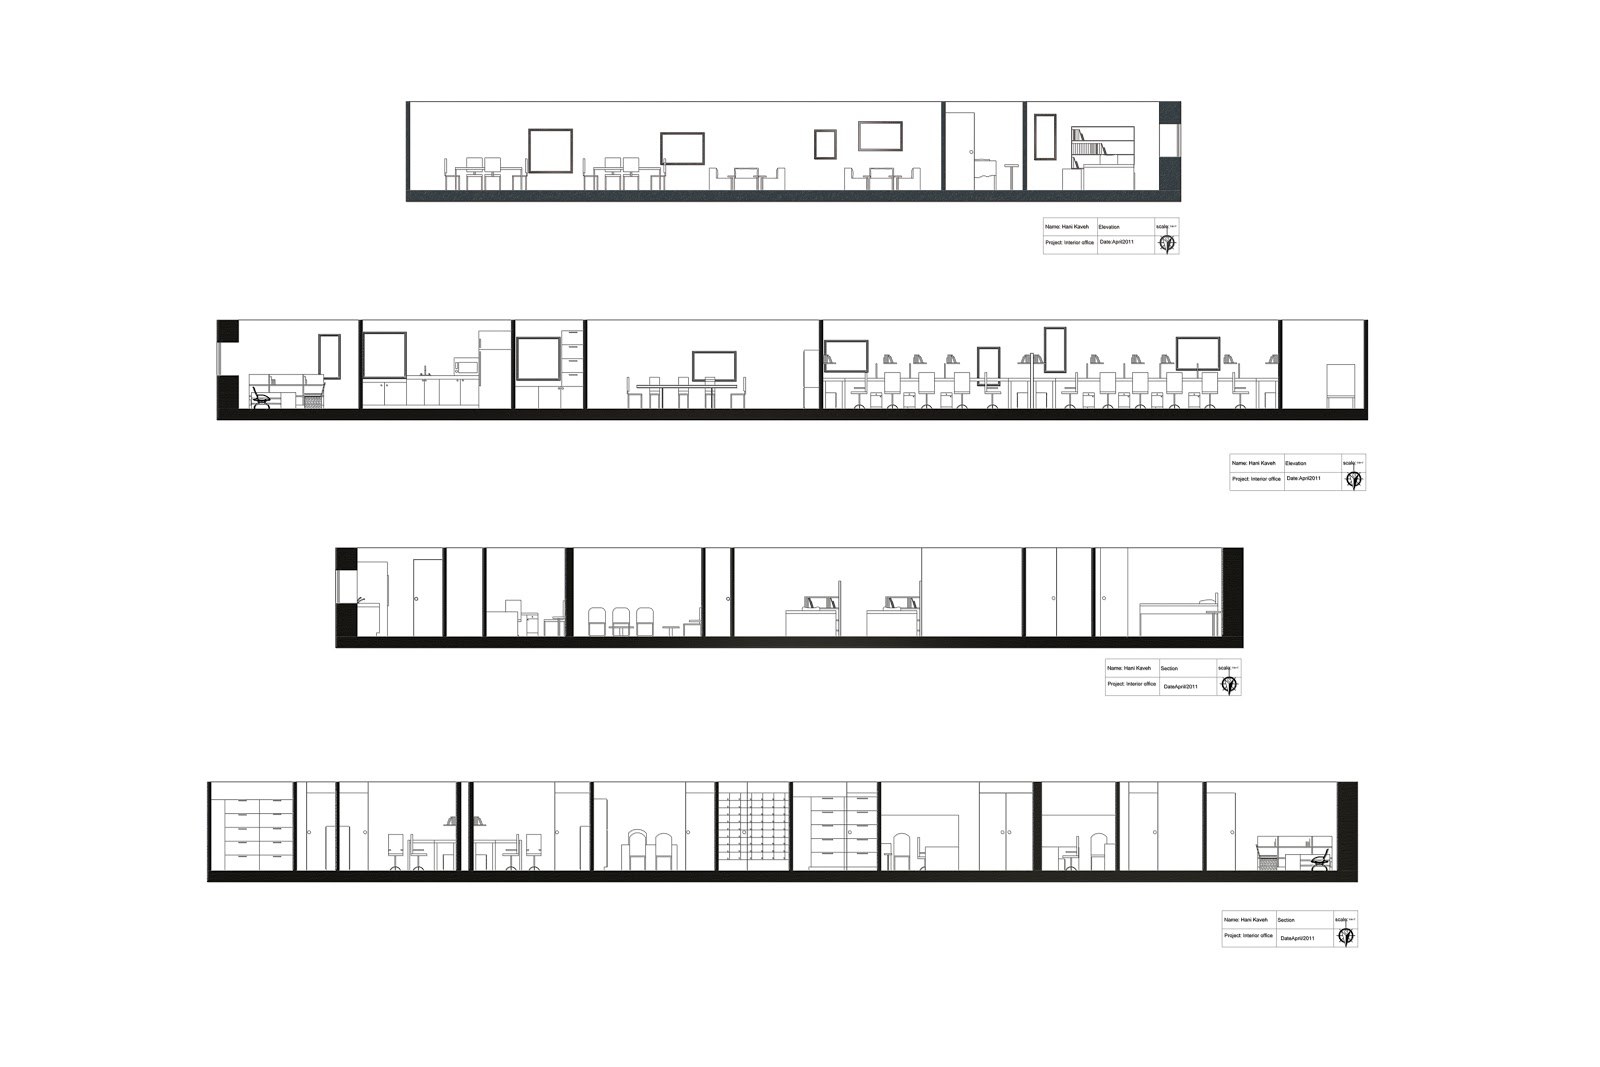 Floor Plan Furniture Office Interior And Furnishing Ocad University Hani